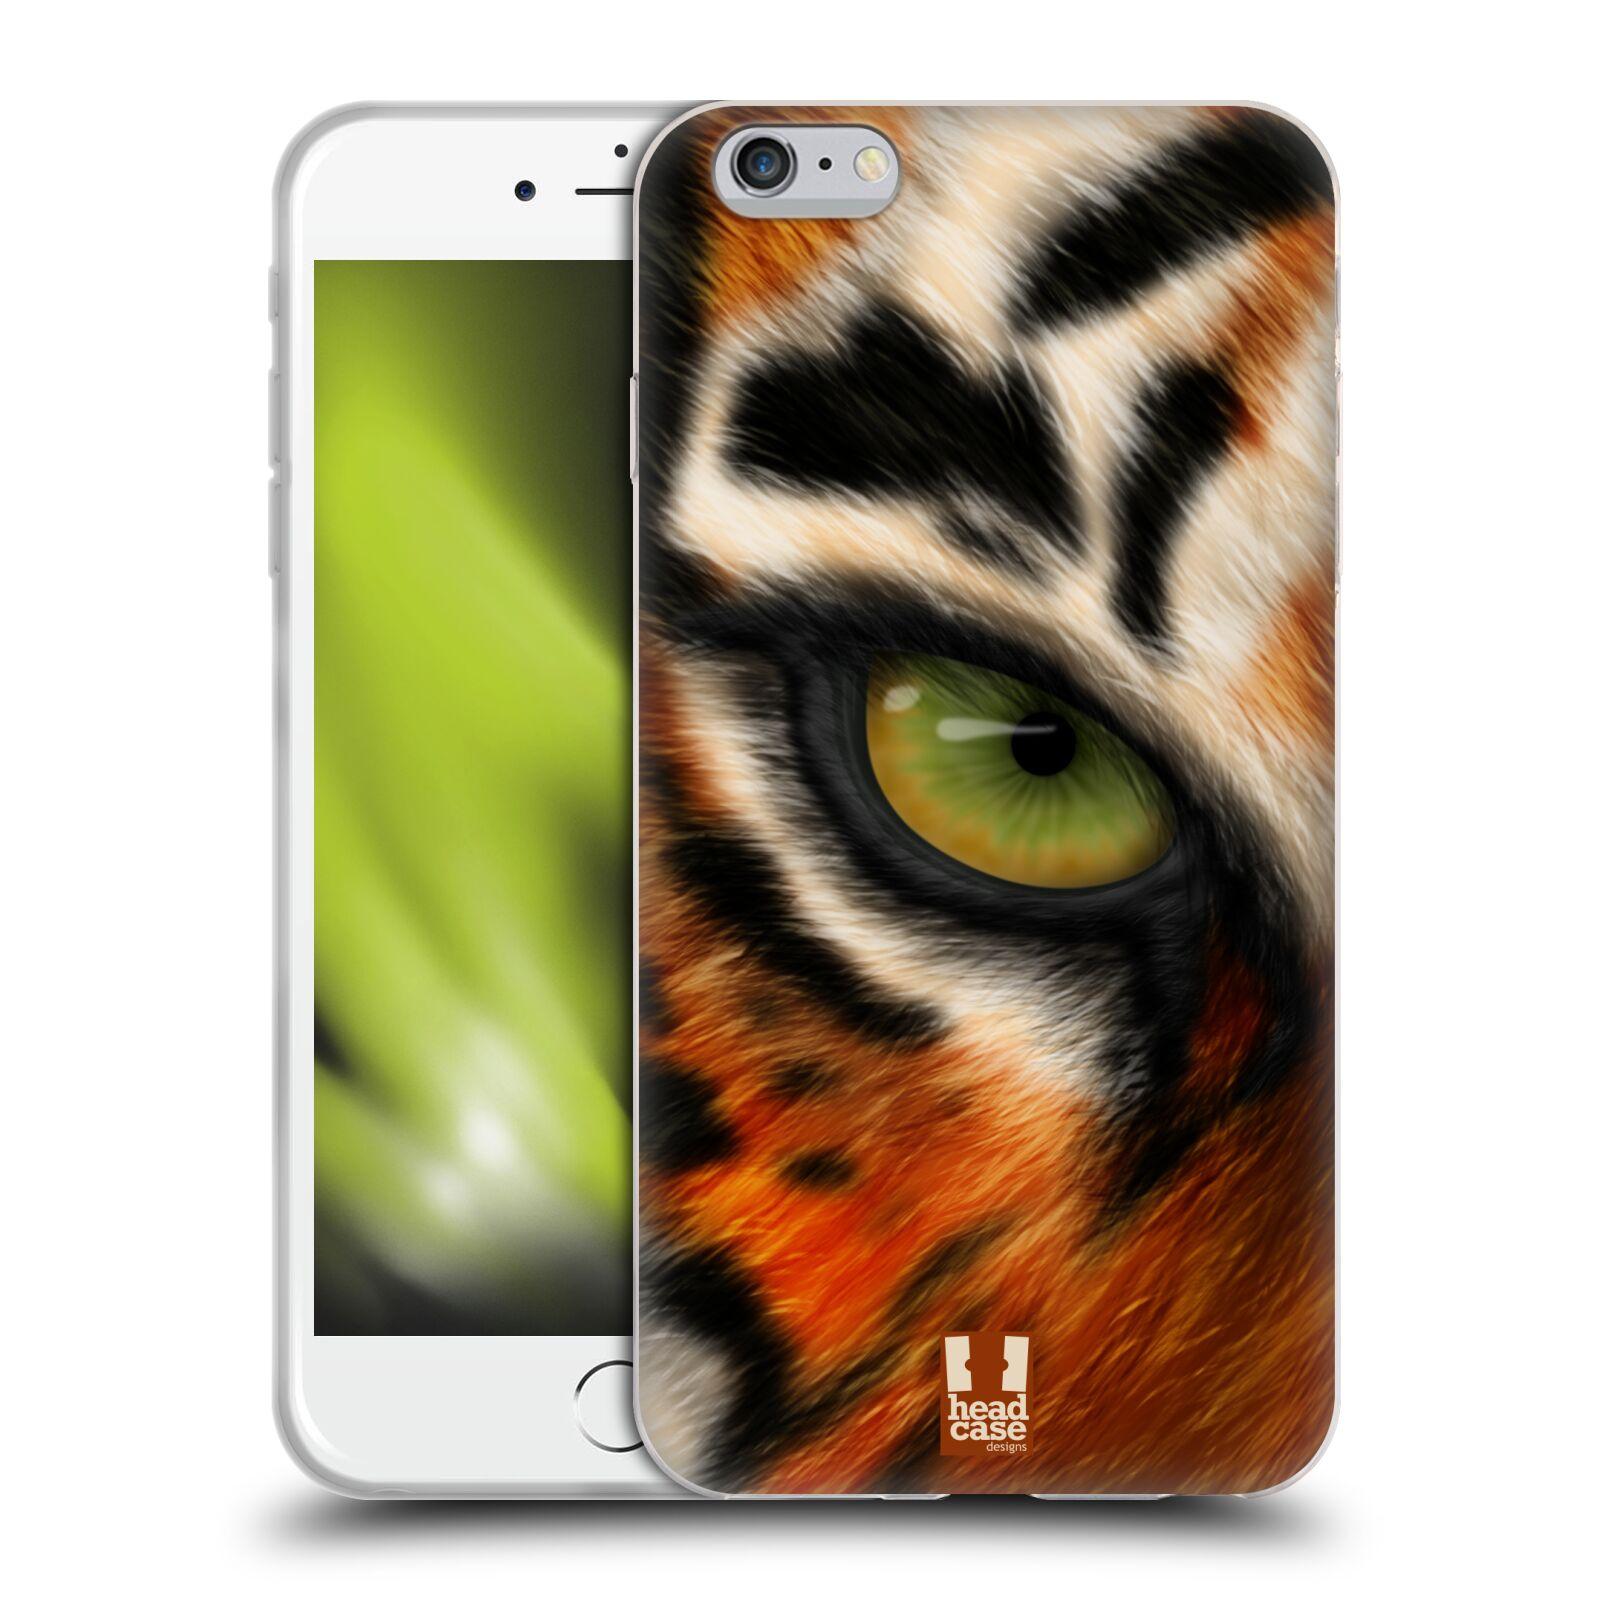 HEAD CASE silikonový obal na mobil Apple Iphone 6 PLUS/ 6S PLUS vzor pohled zvířete oko tygr